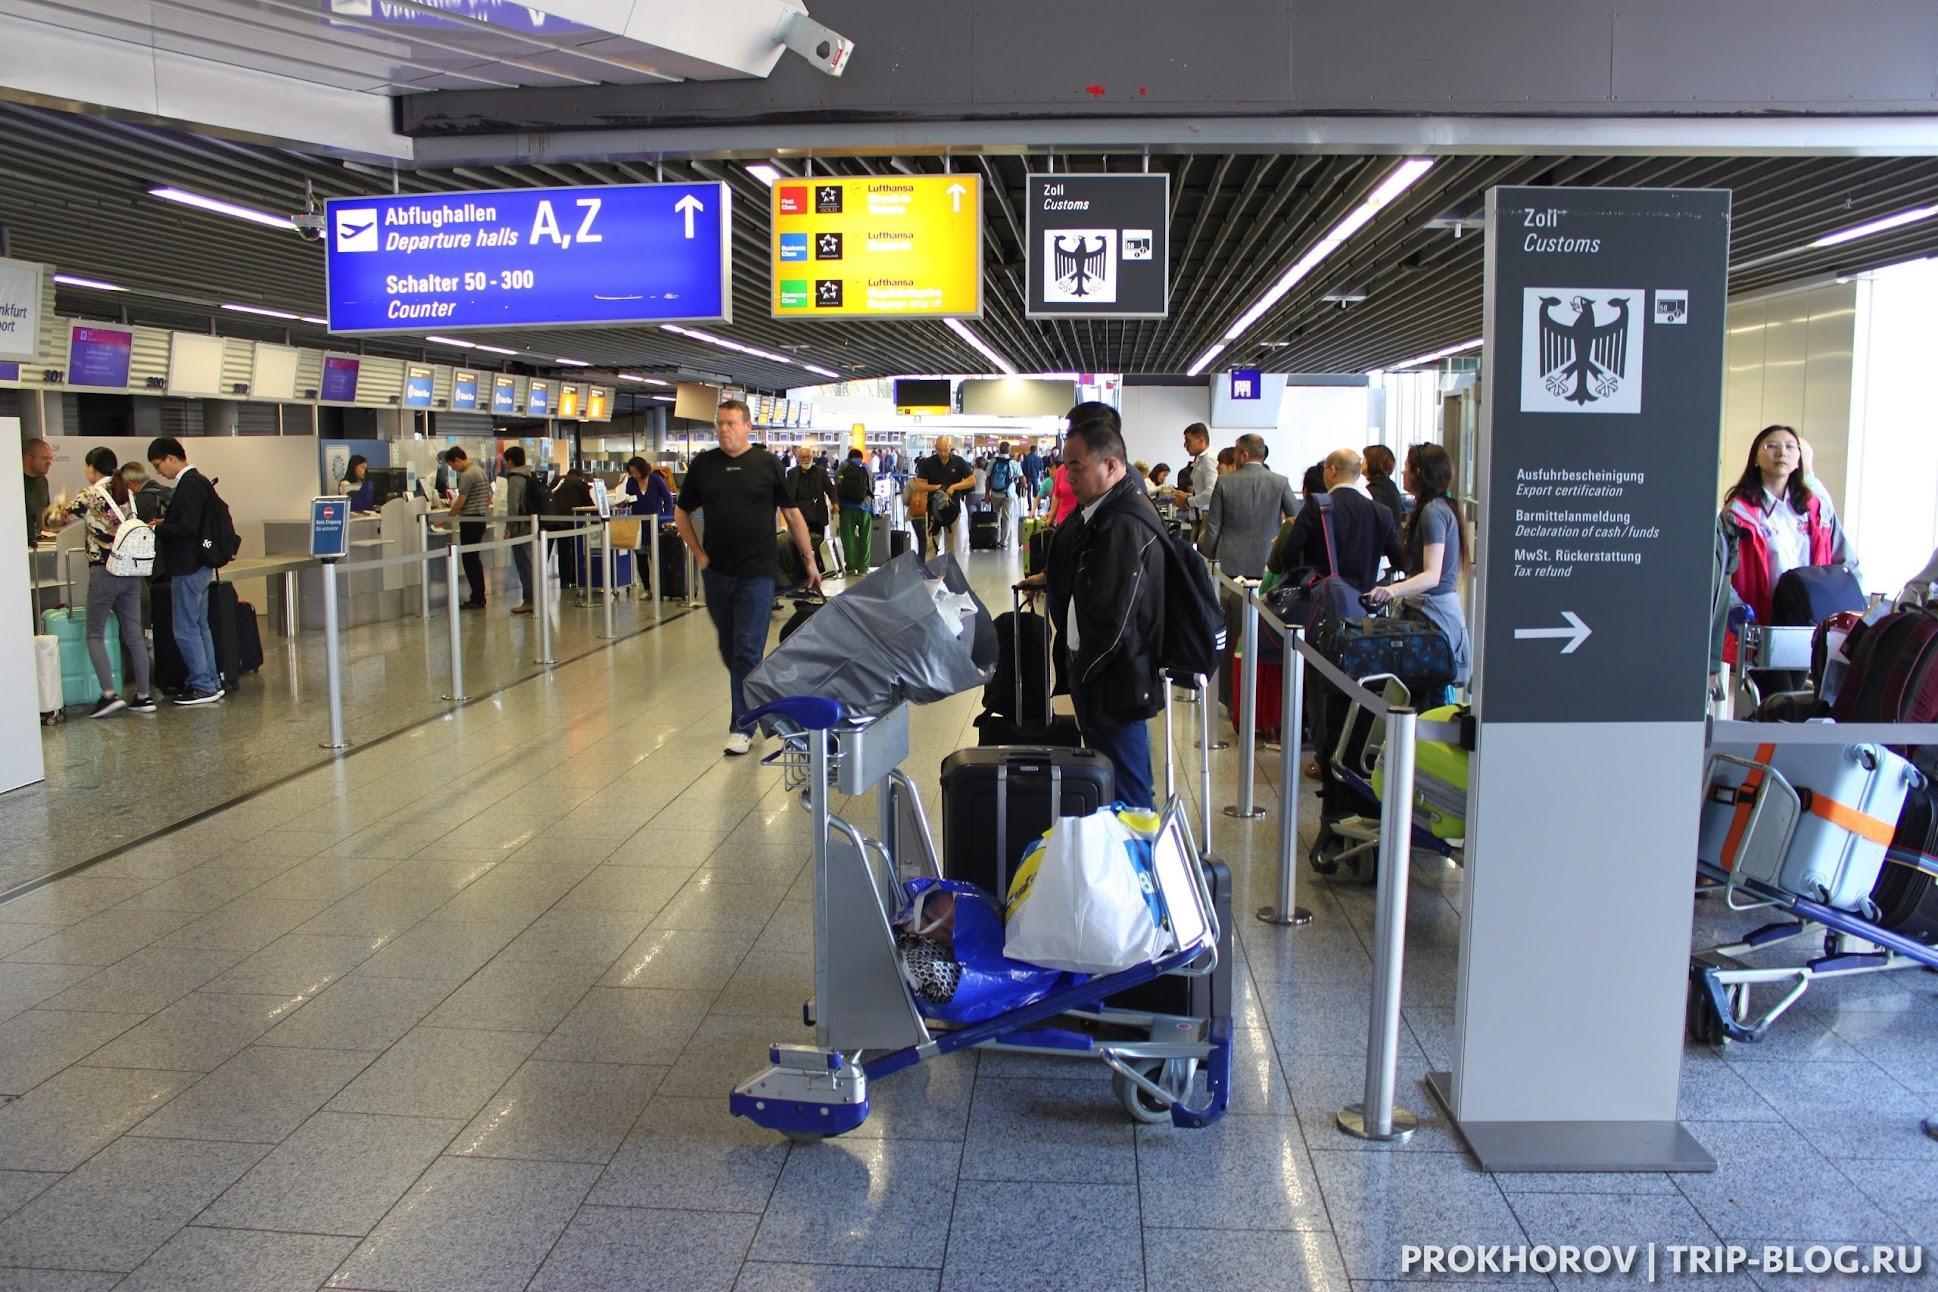 Таможенный пункт в аэропорту Франкфурта